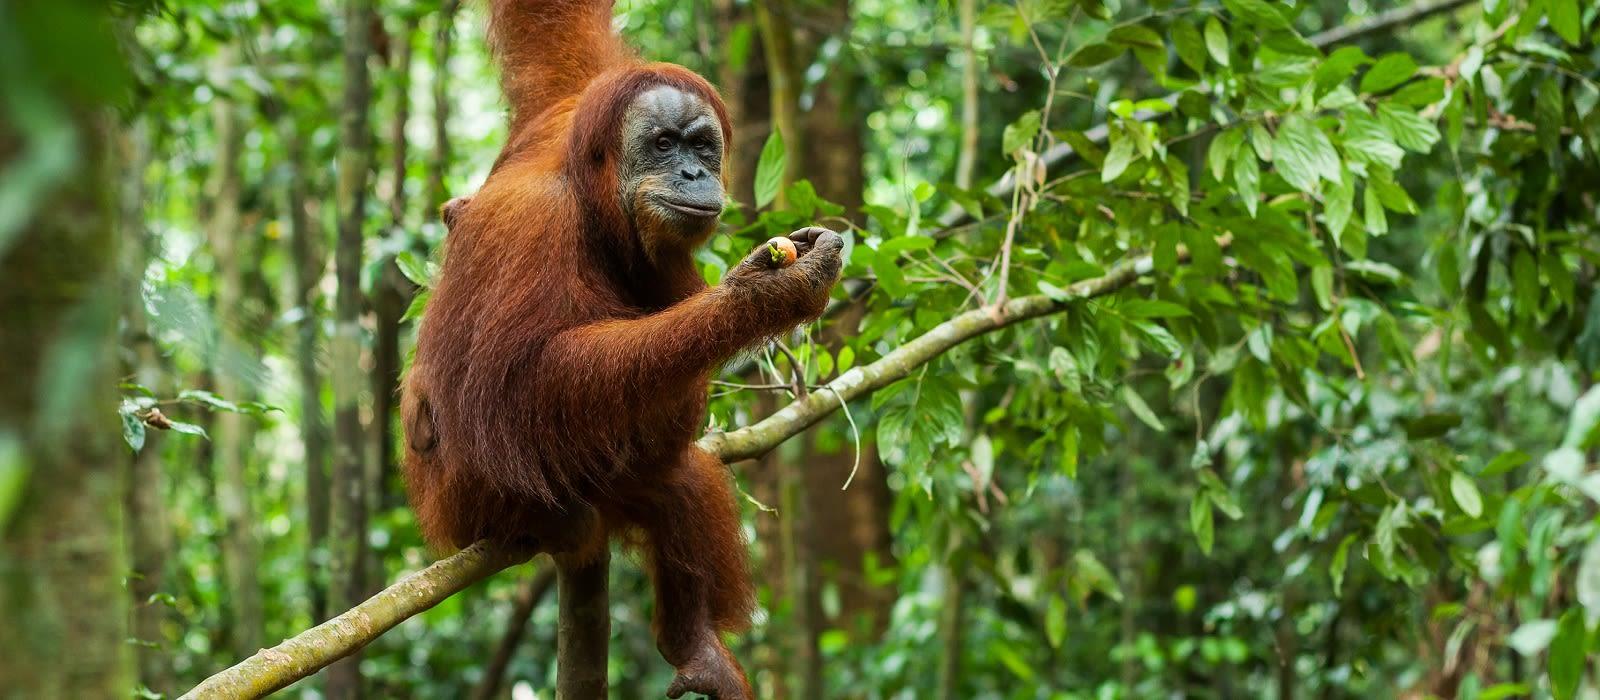 Die Klassiker auf Sumatra und Java Urlaub 1